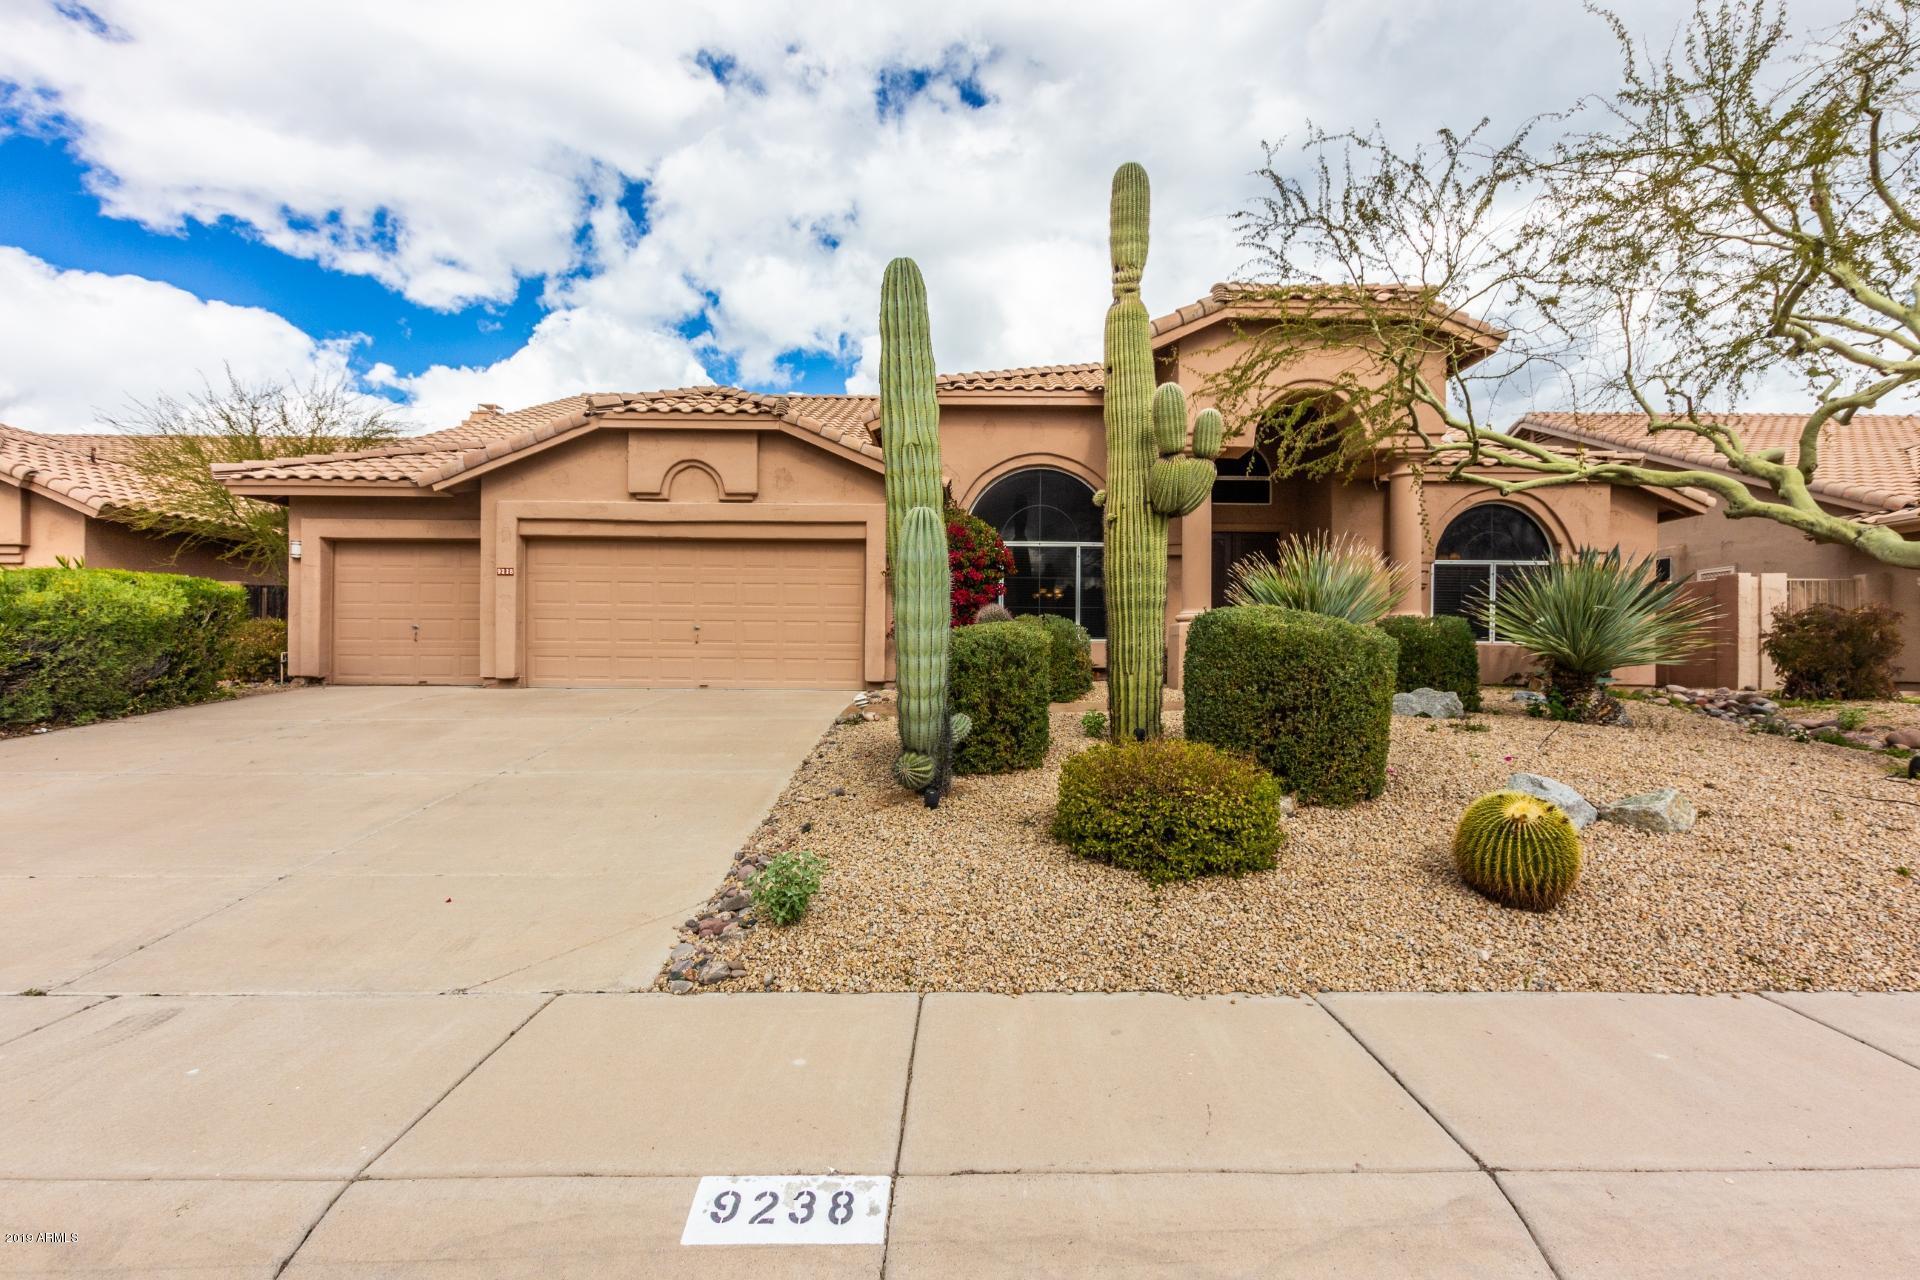 Photo of 9238 E PALM TREE Drive, Scottsdale, AZ 85255